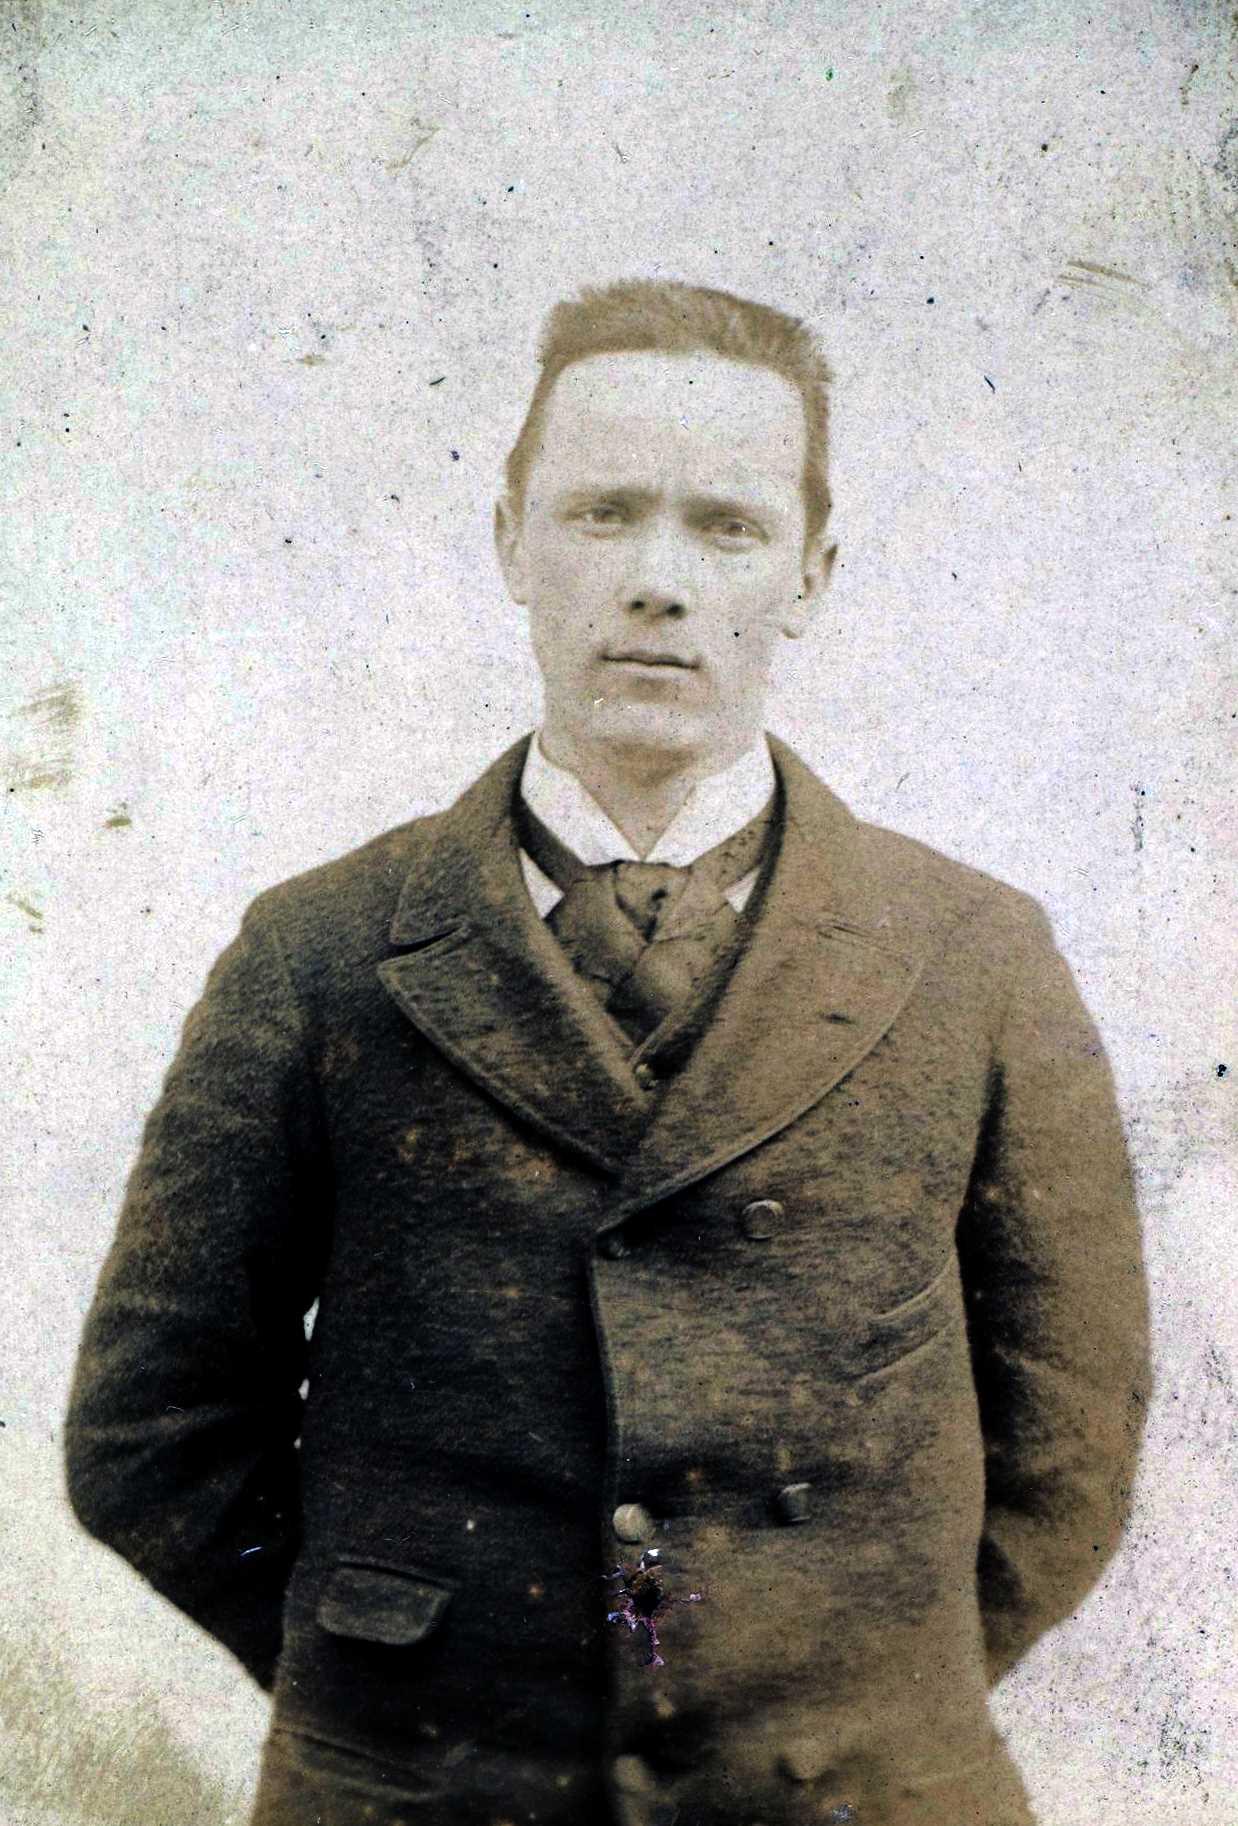 Foto policíaca de Gustave Mathieu